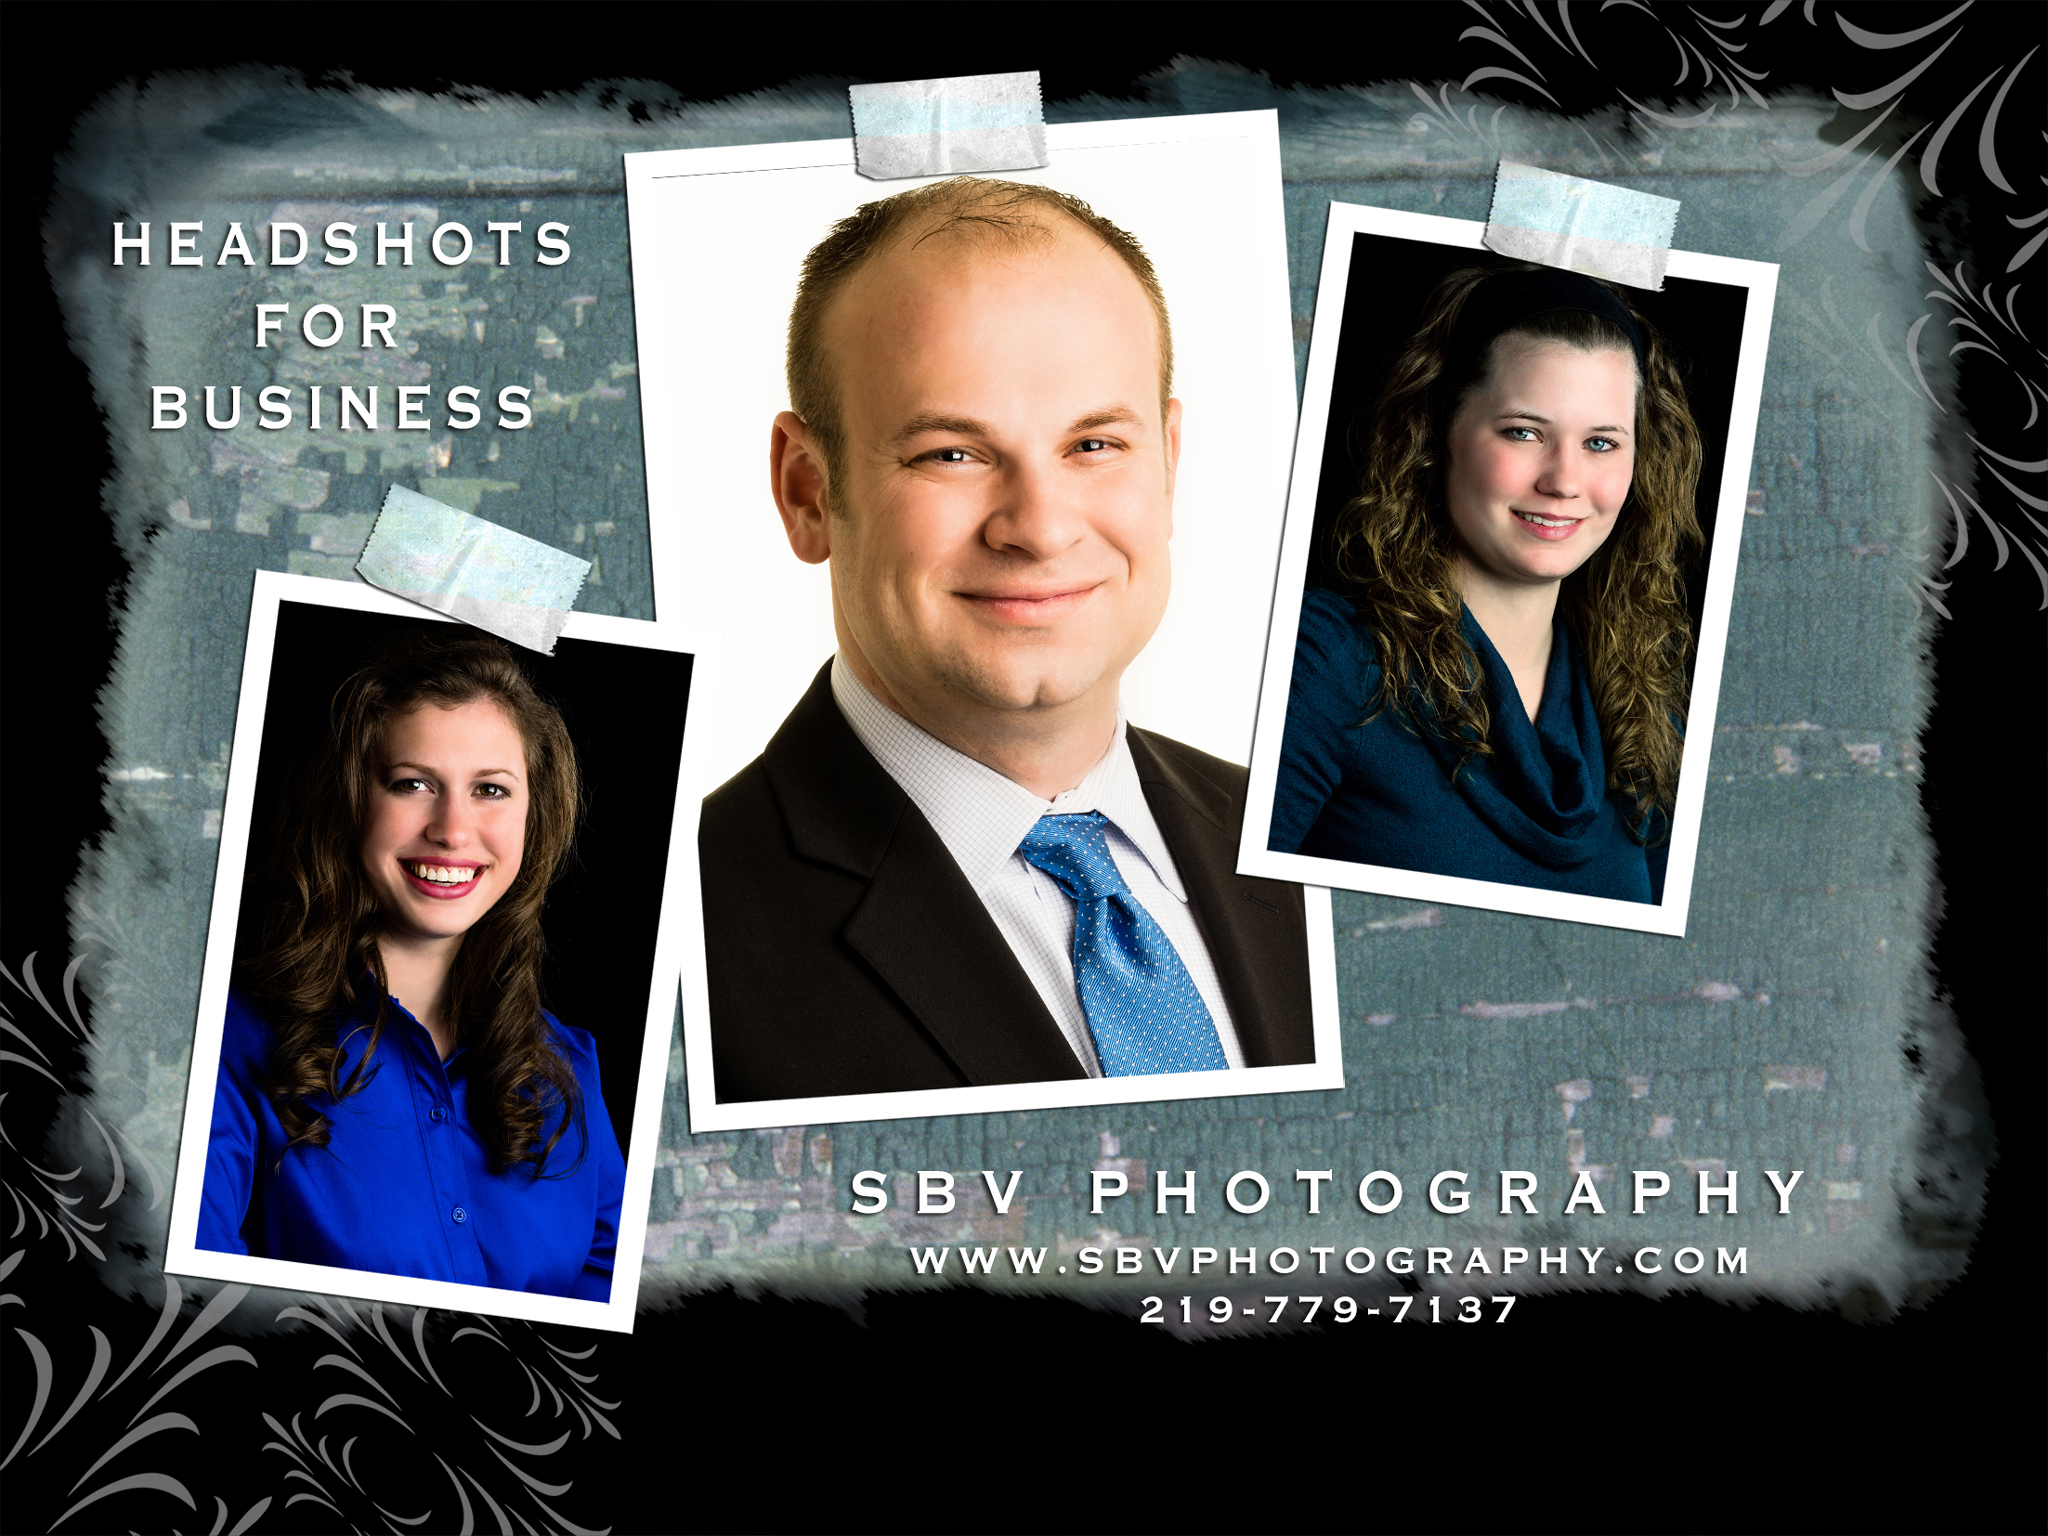 web-headshot-promo-card-front.jpg